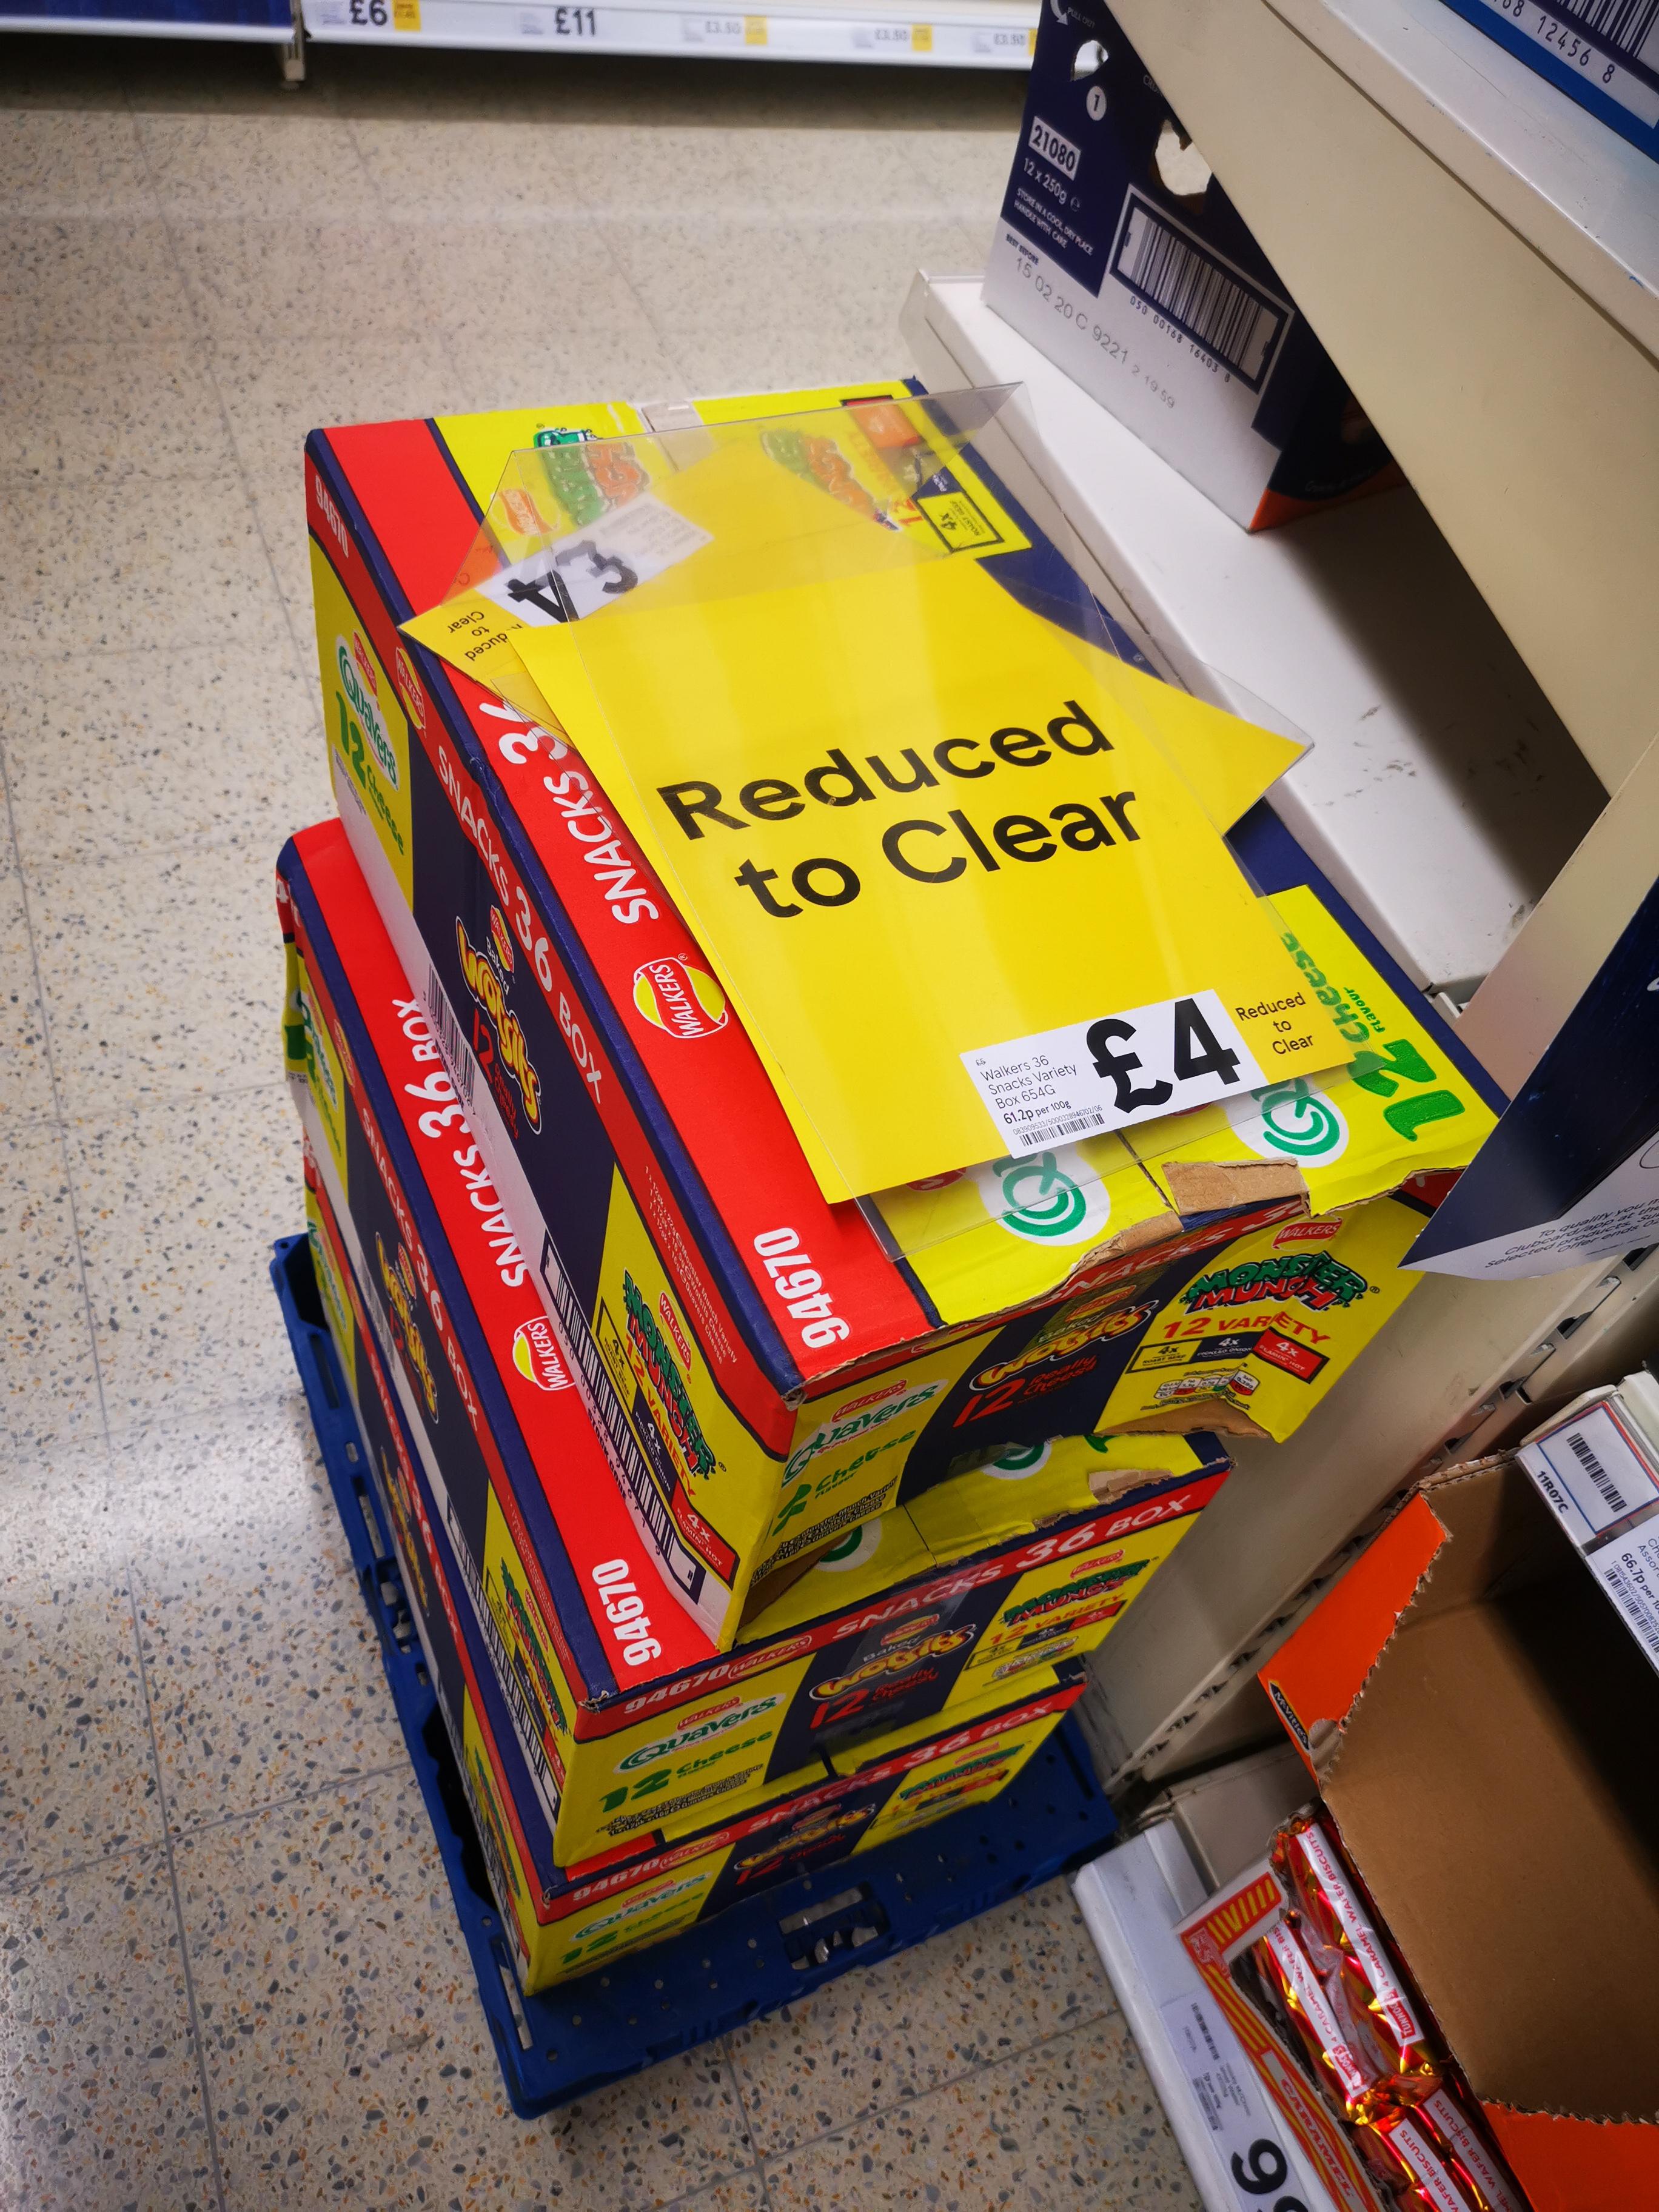 36 Box Of Walkers Crisps, 12 x Quavers, 12 x Monster Munch, 12 x Wotsits, £4 @ Tesco Metro, St Enoch, Glasgow